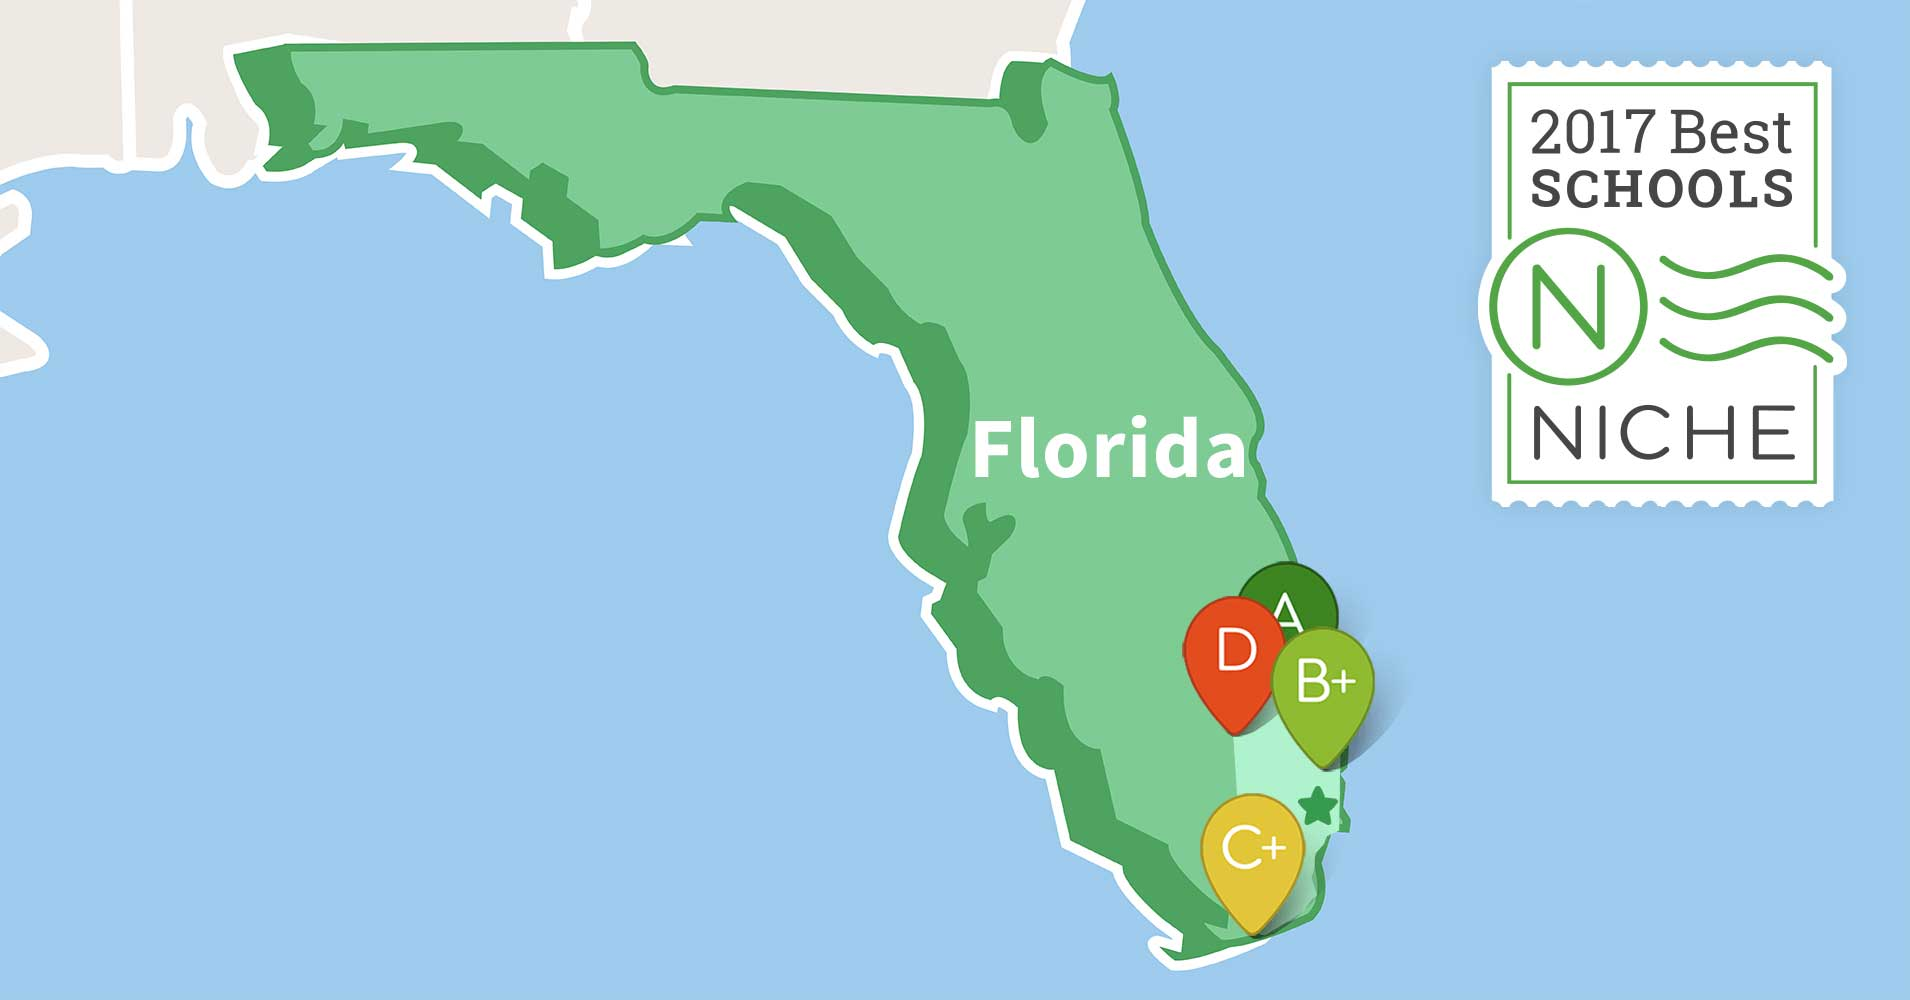 Miami hook up sites